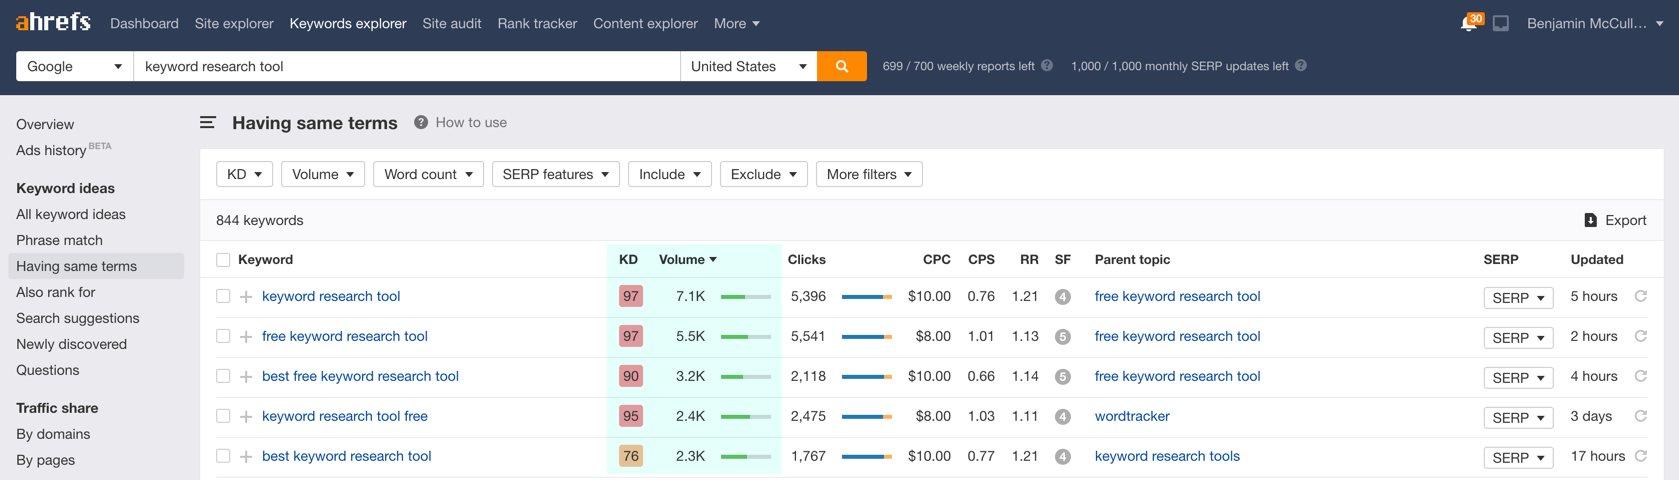 AHrefs Keyword Explorer –Keyword Research Tool